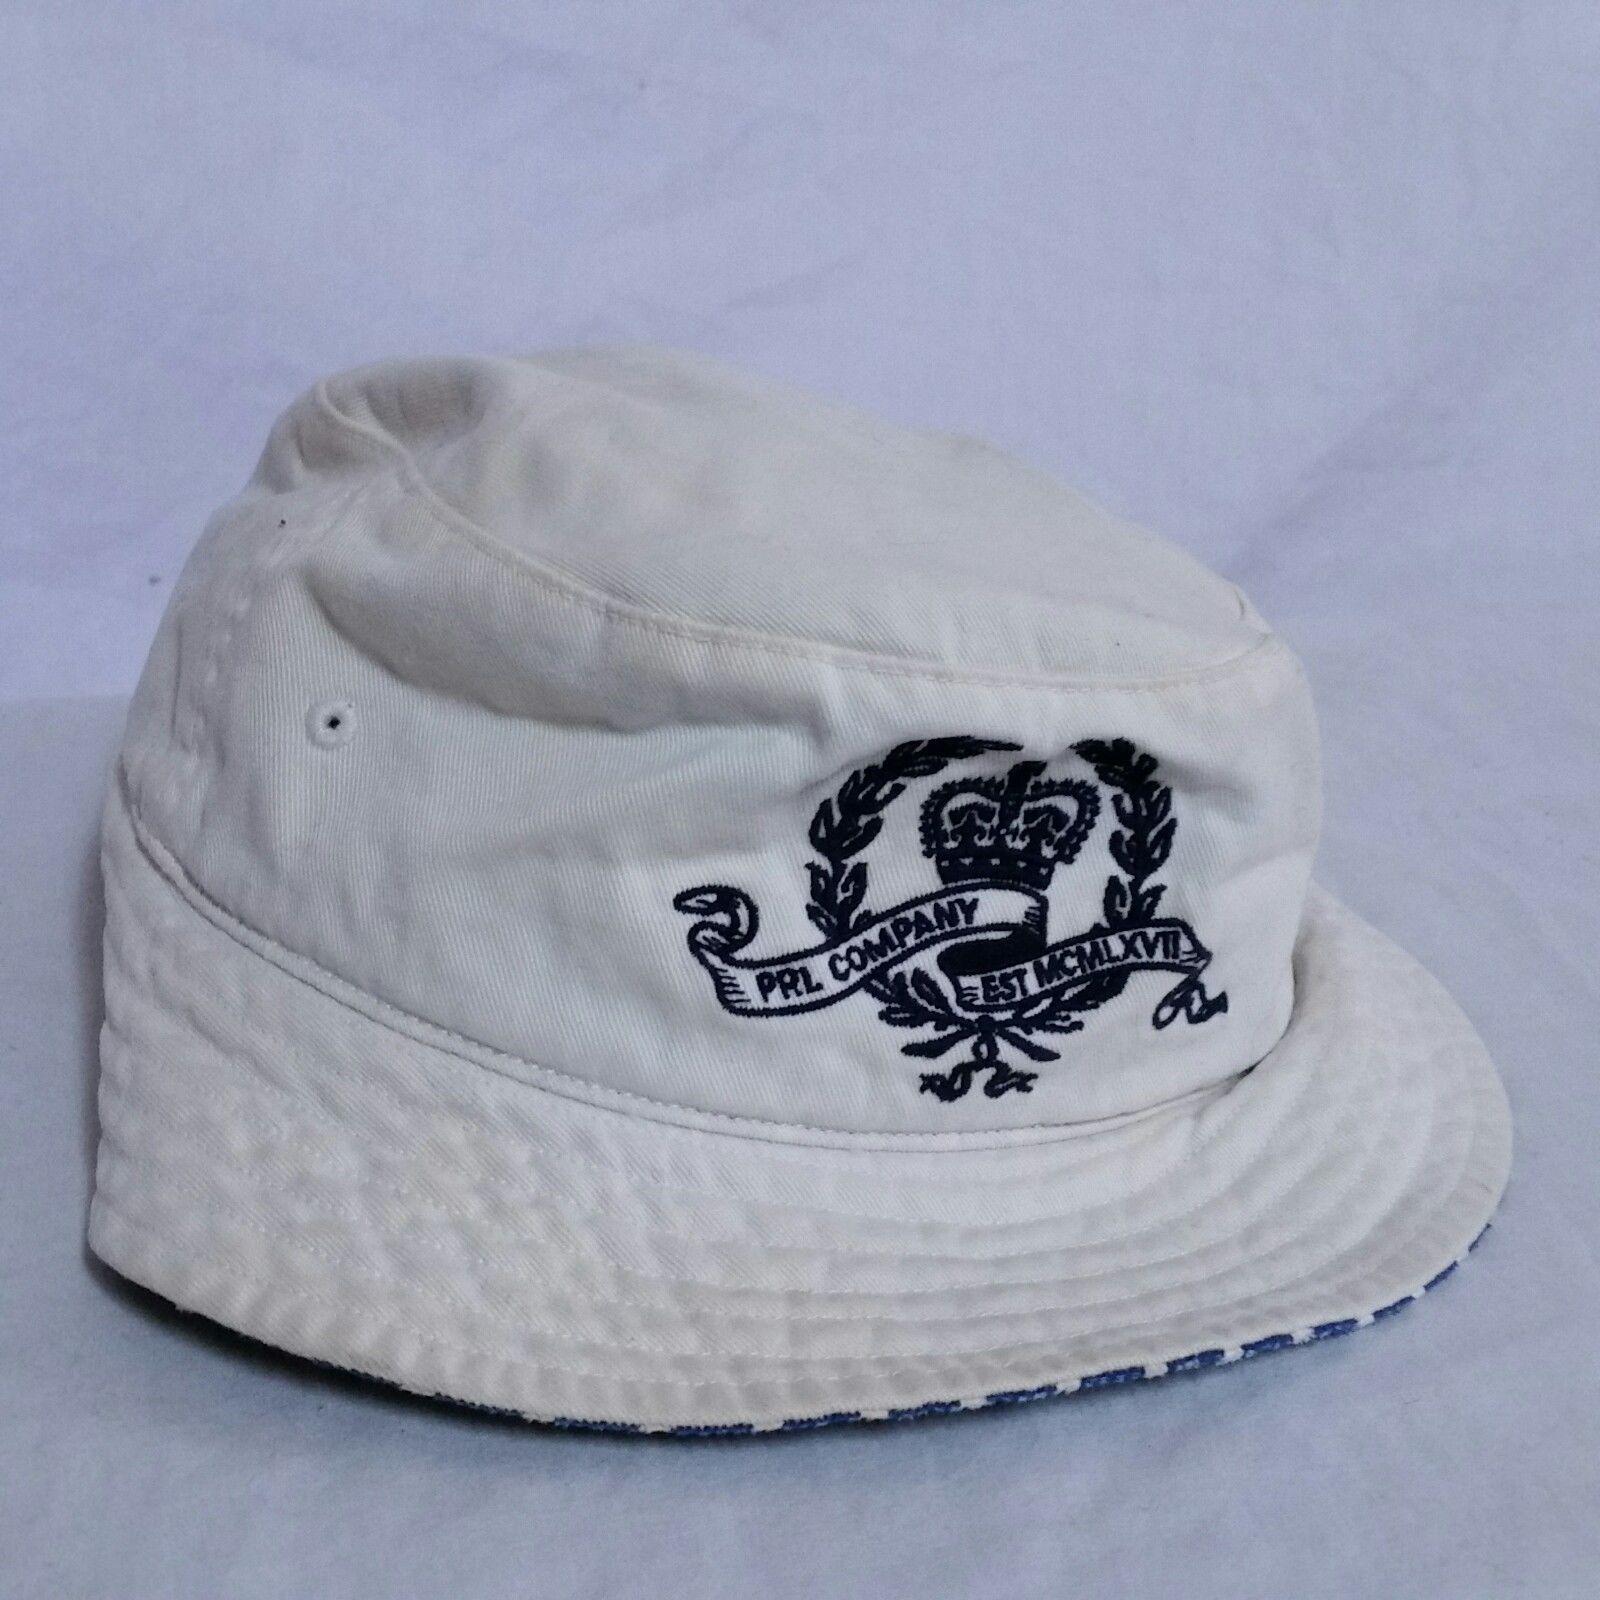 77dbac1e8545c VTG Polo Ralph Lauren Bucket Hat Crest Crown Spell Out 90s Sport Bear  Fisherman